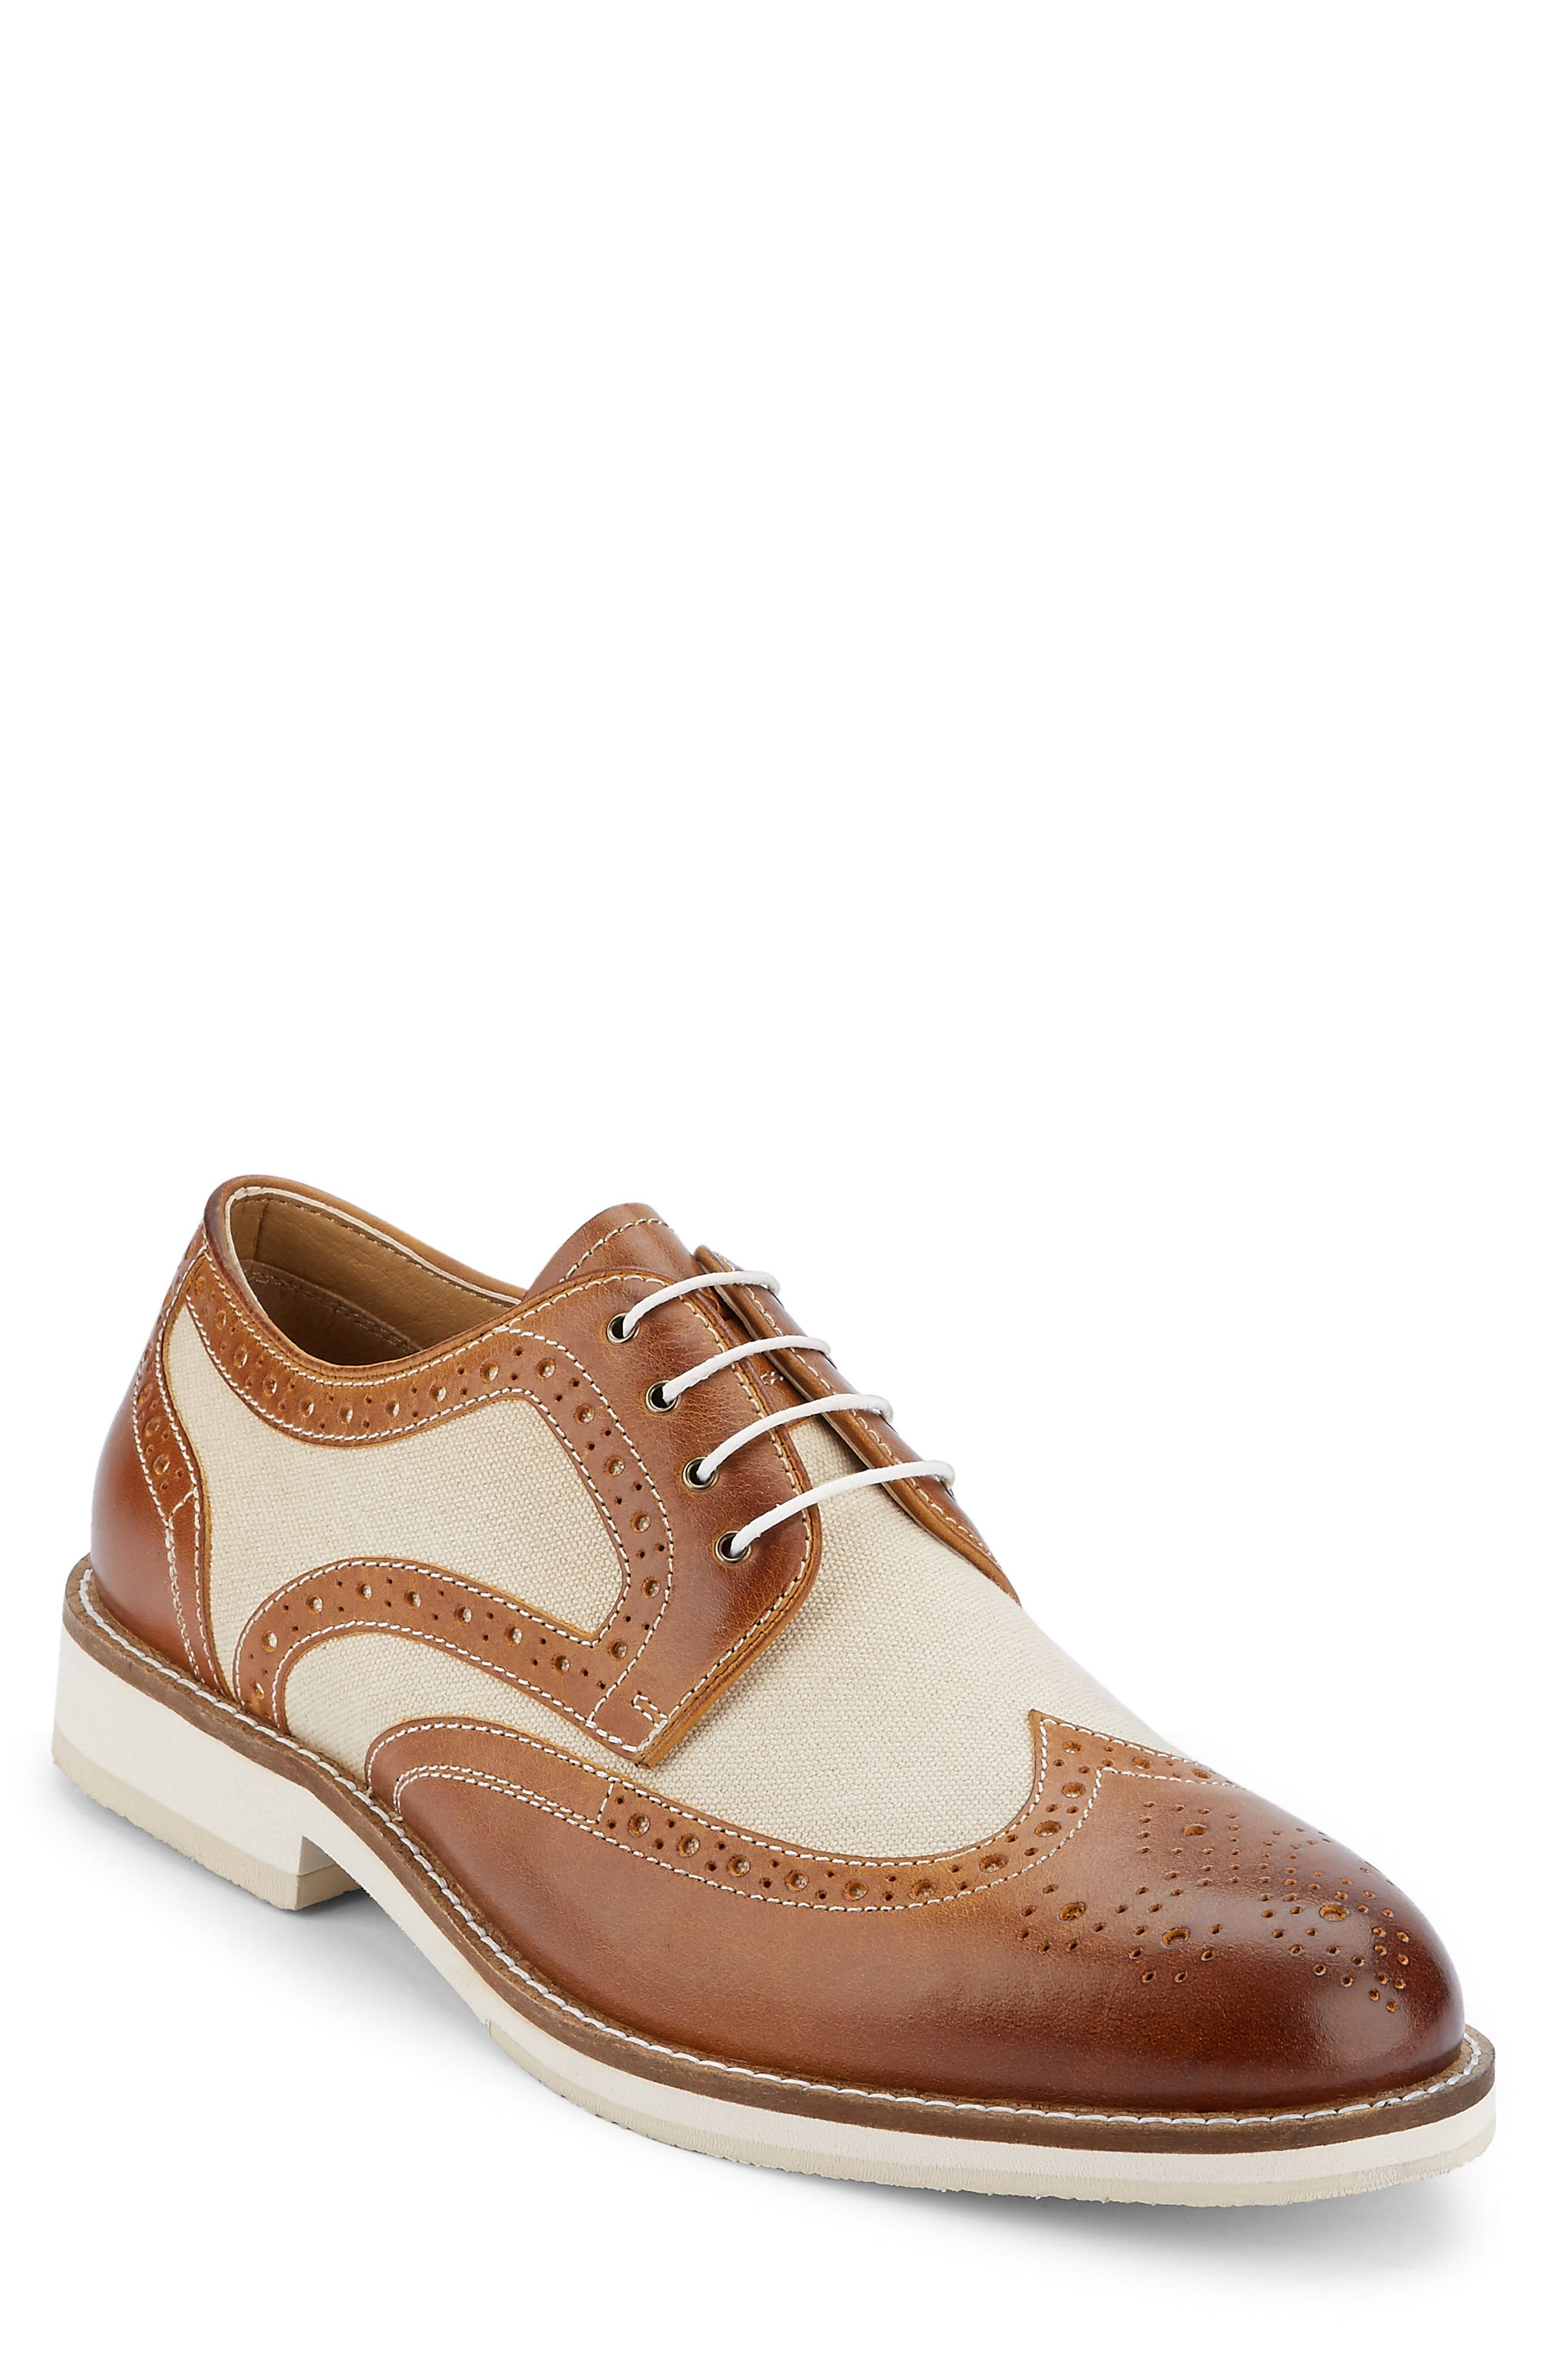 Alternate Image 1 Selected - G.H. Bass & Co. Norman Spectator Shoe (Men)